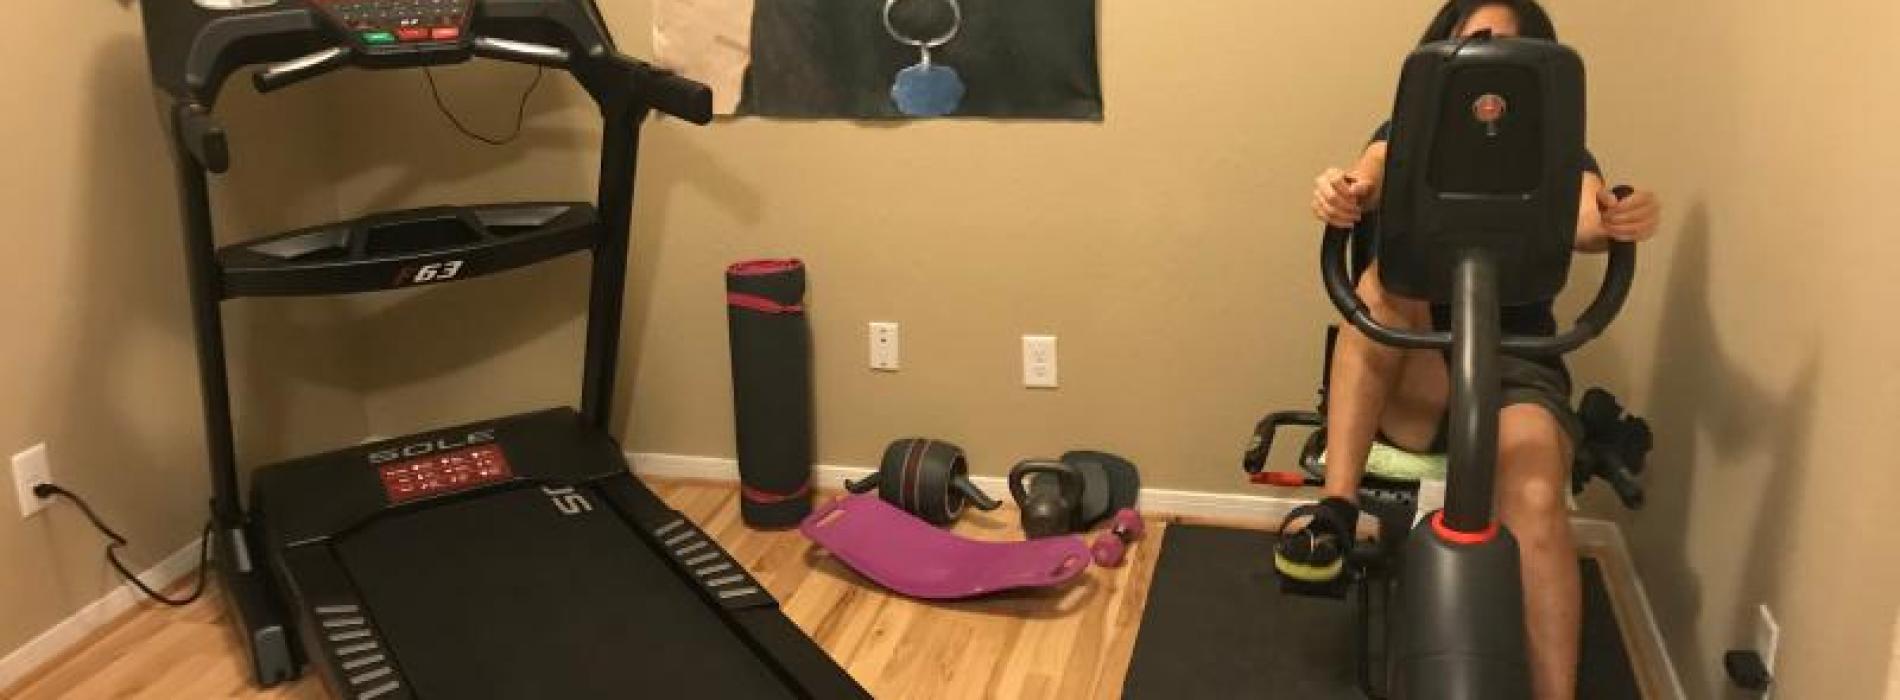 Buy the latest Sole f63 Treadmill